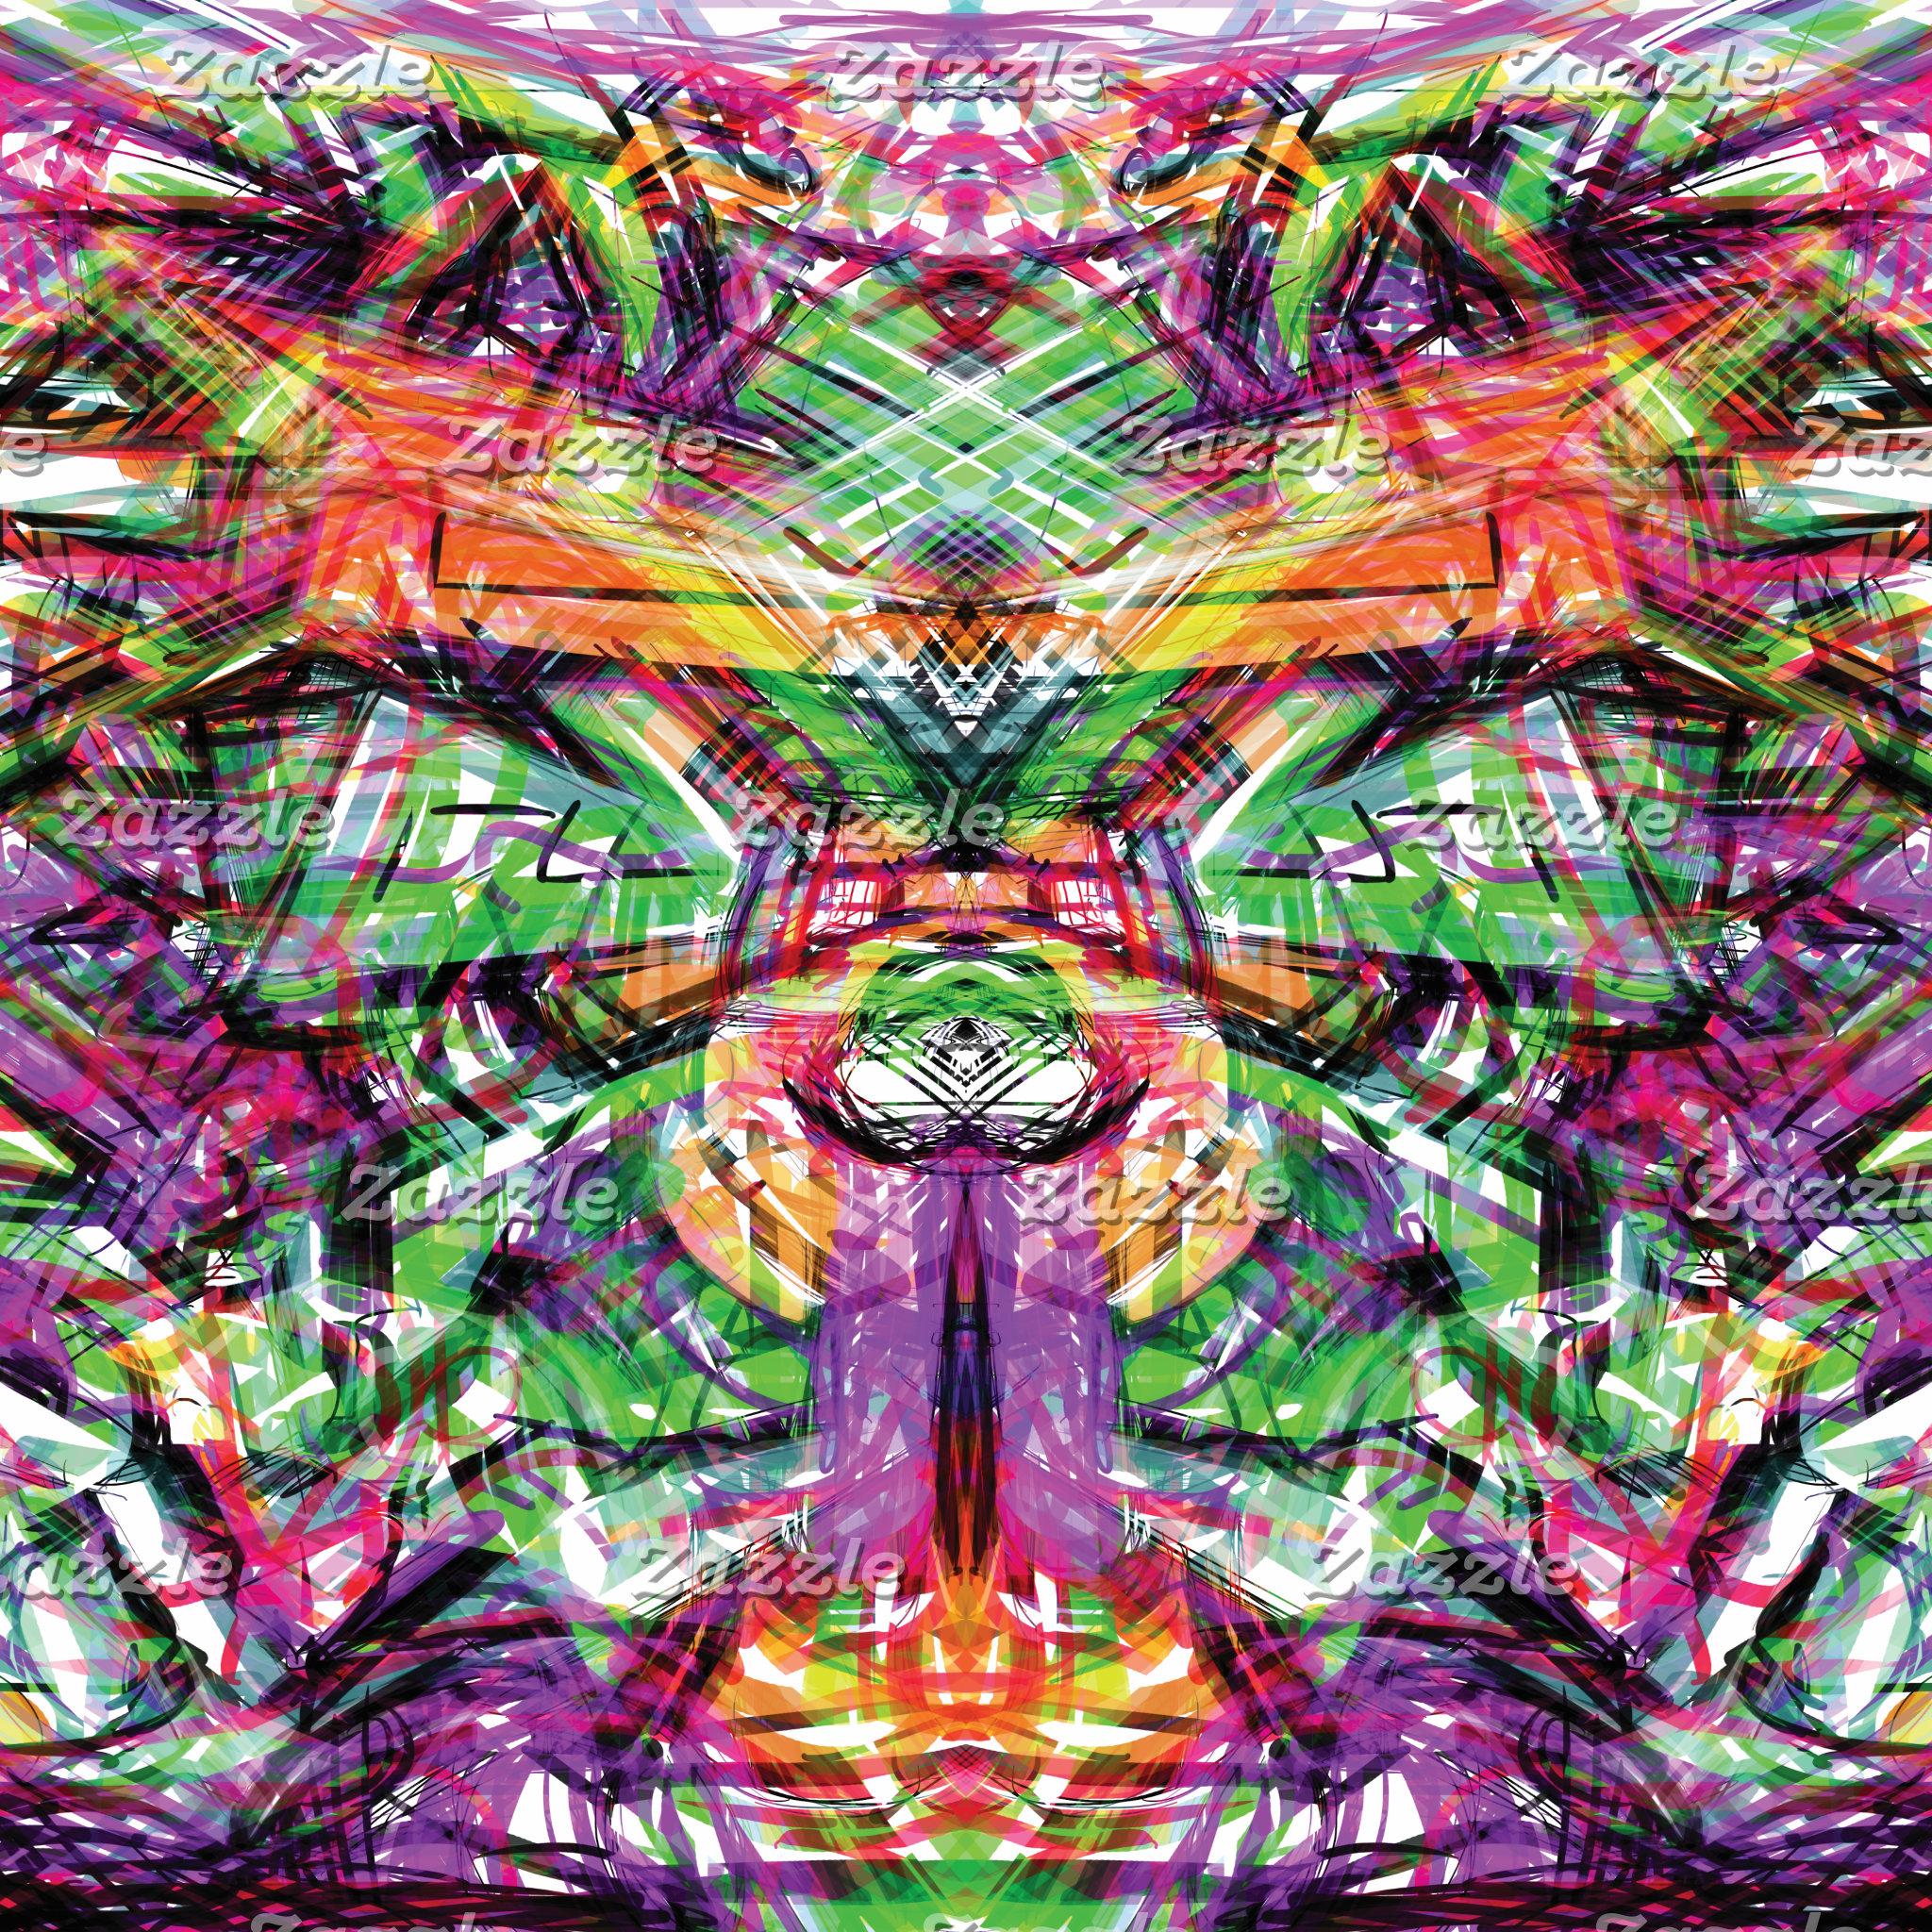 Neon Tribal Graffiti Abstract ArtWork